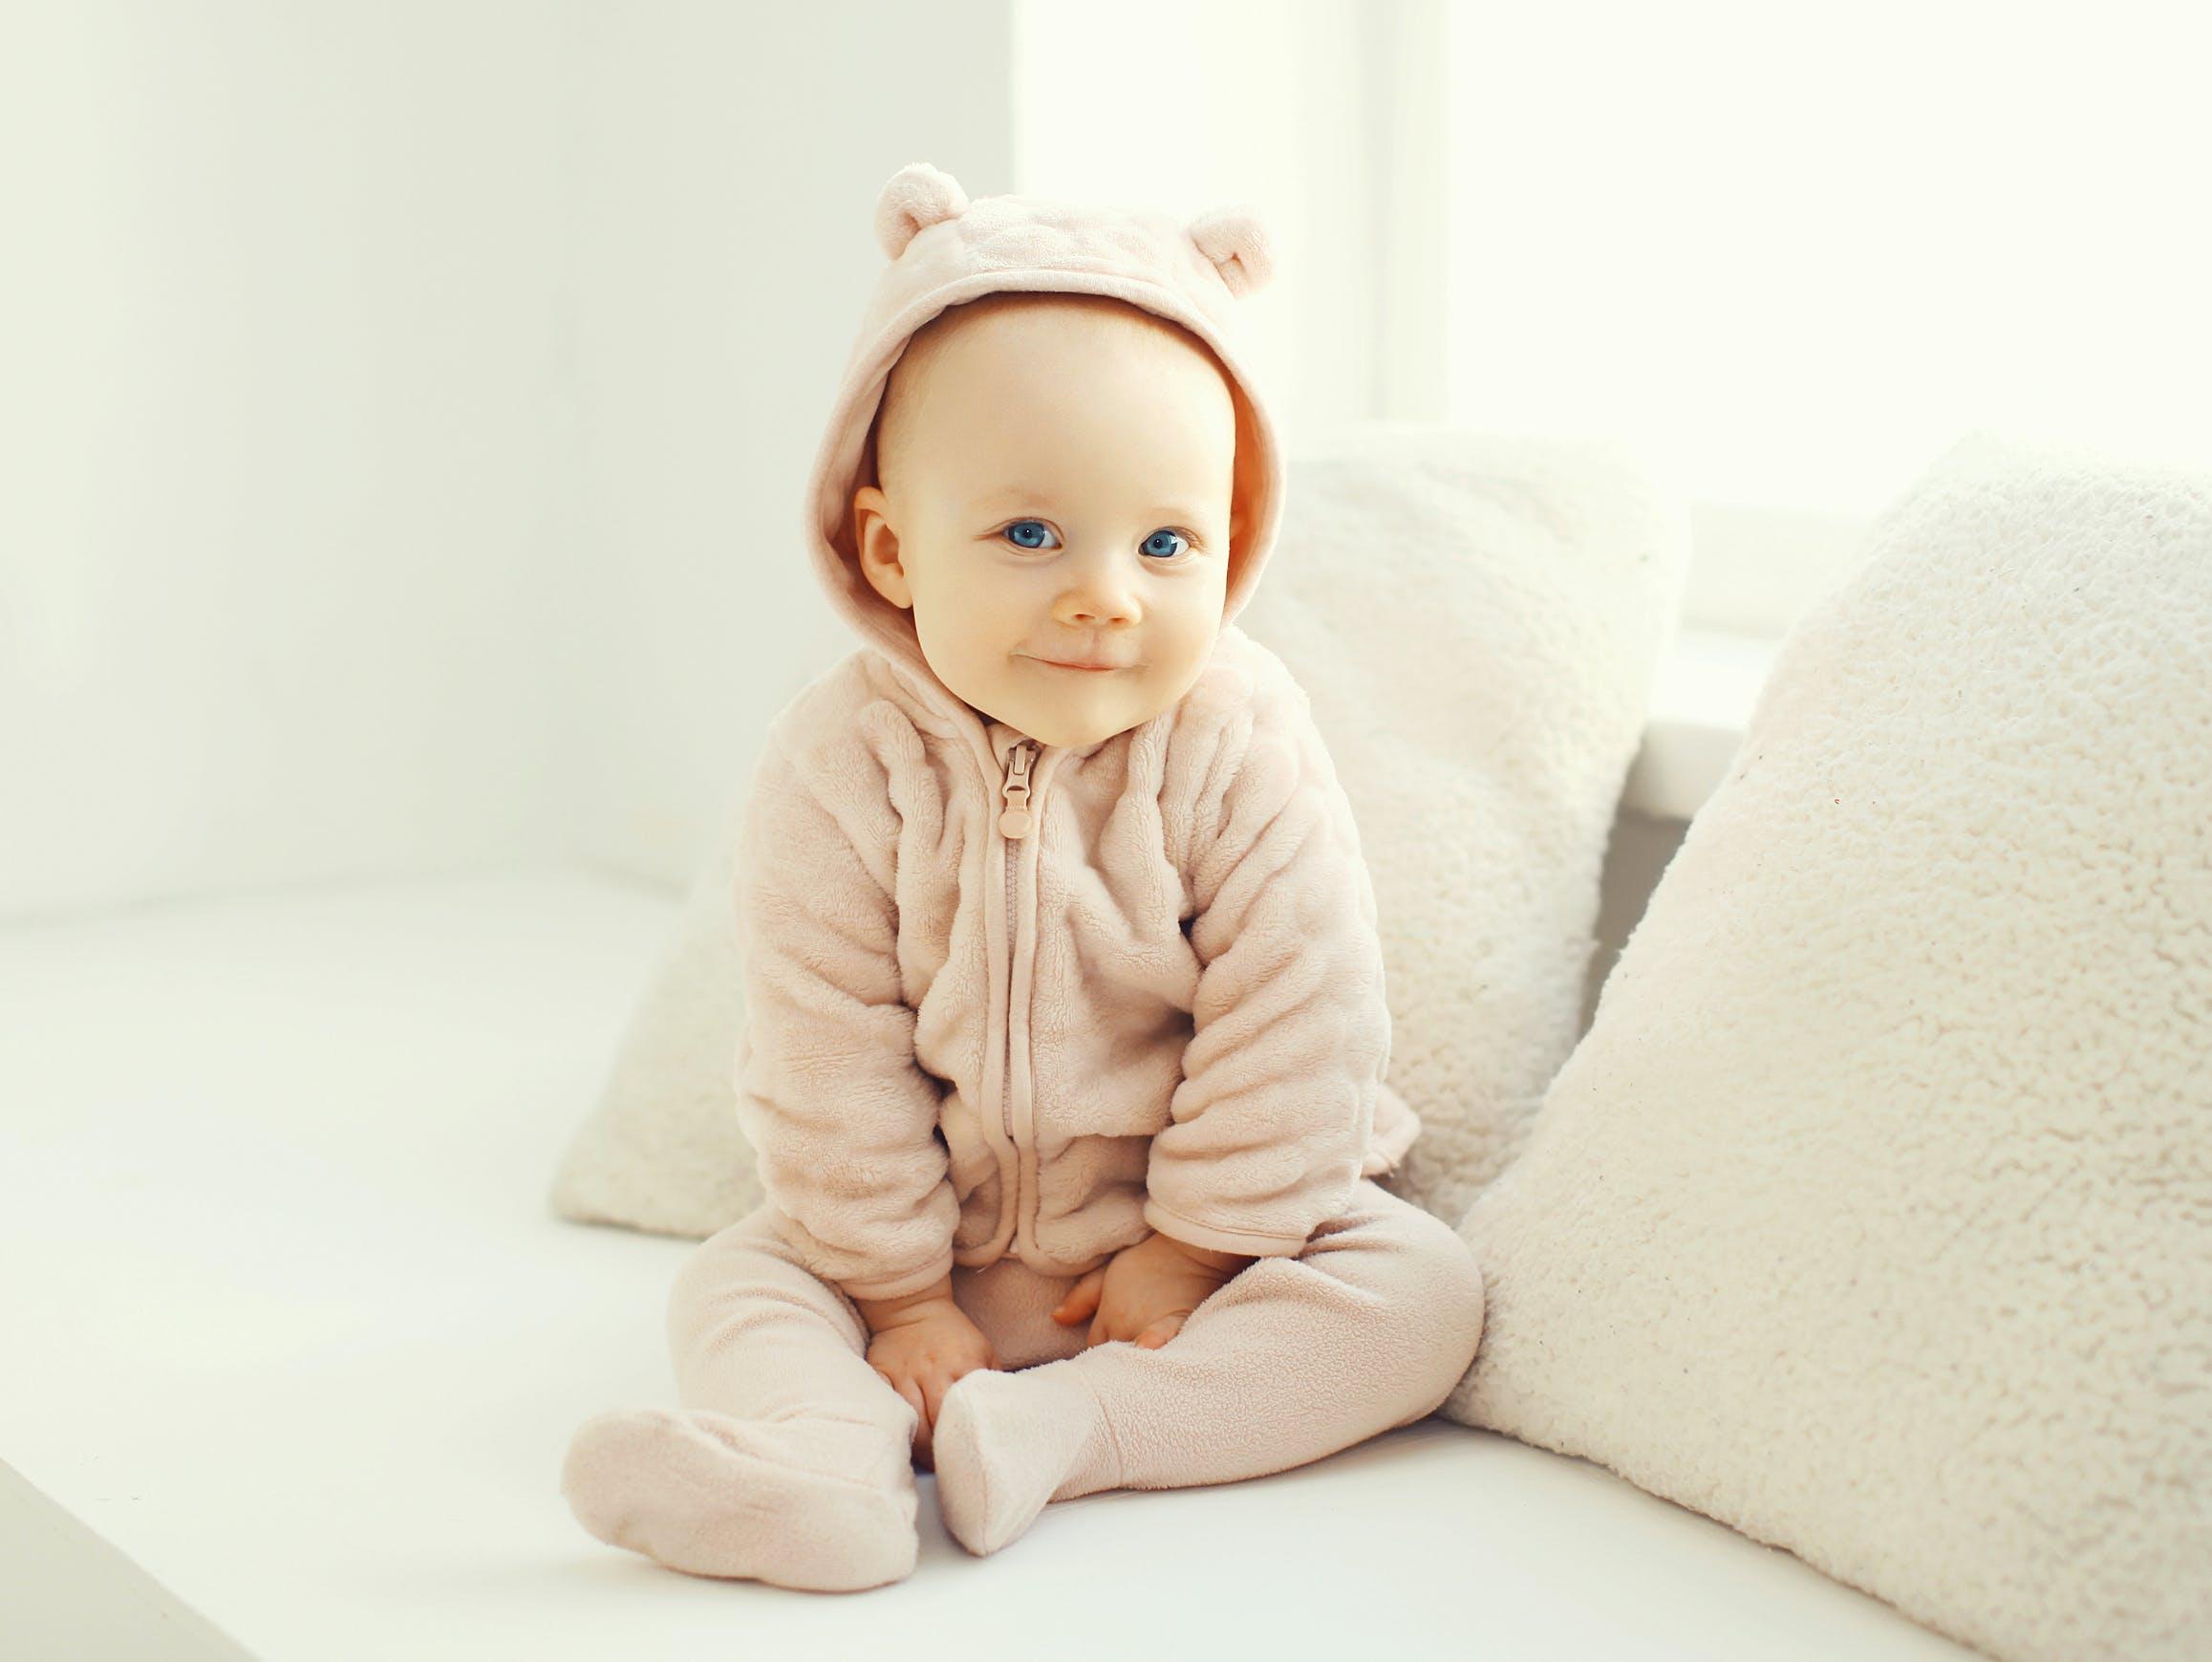 Animal names for babies.jpg?ixlib=rails 3.0